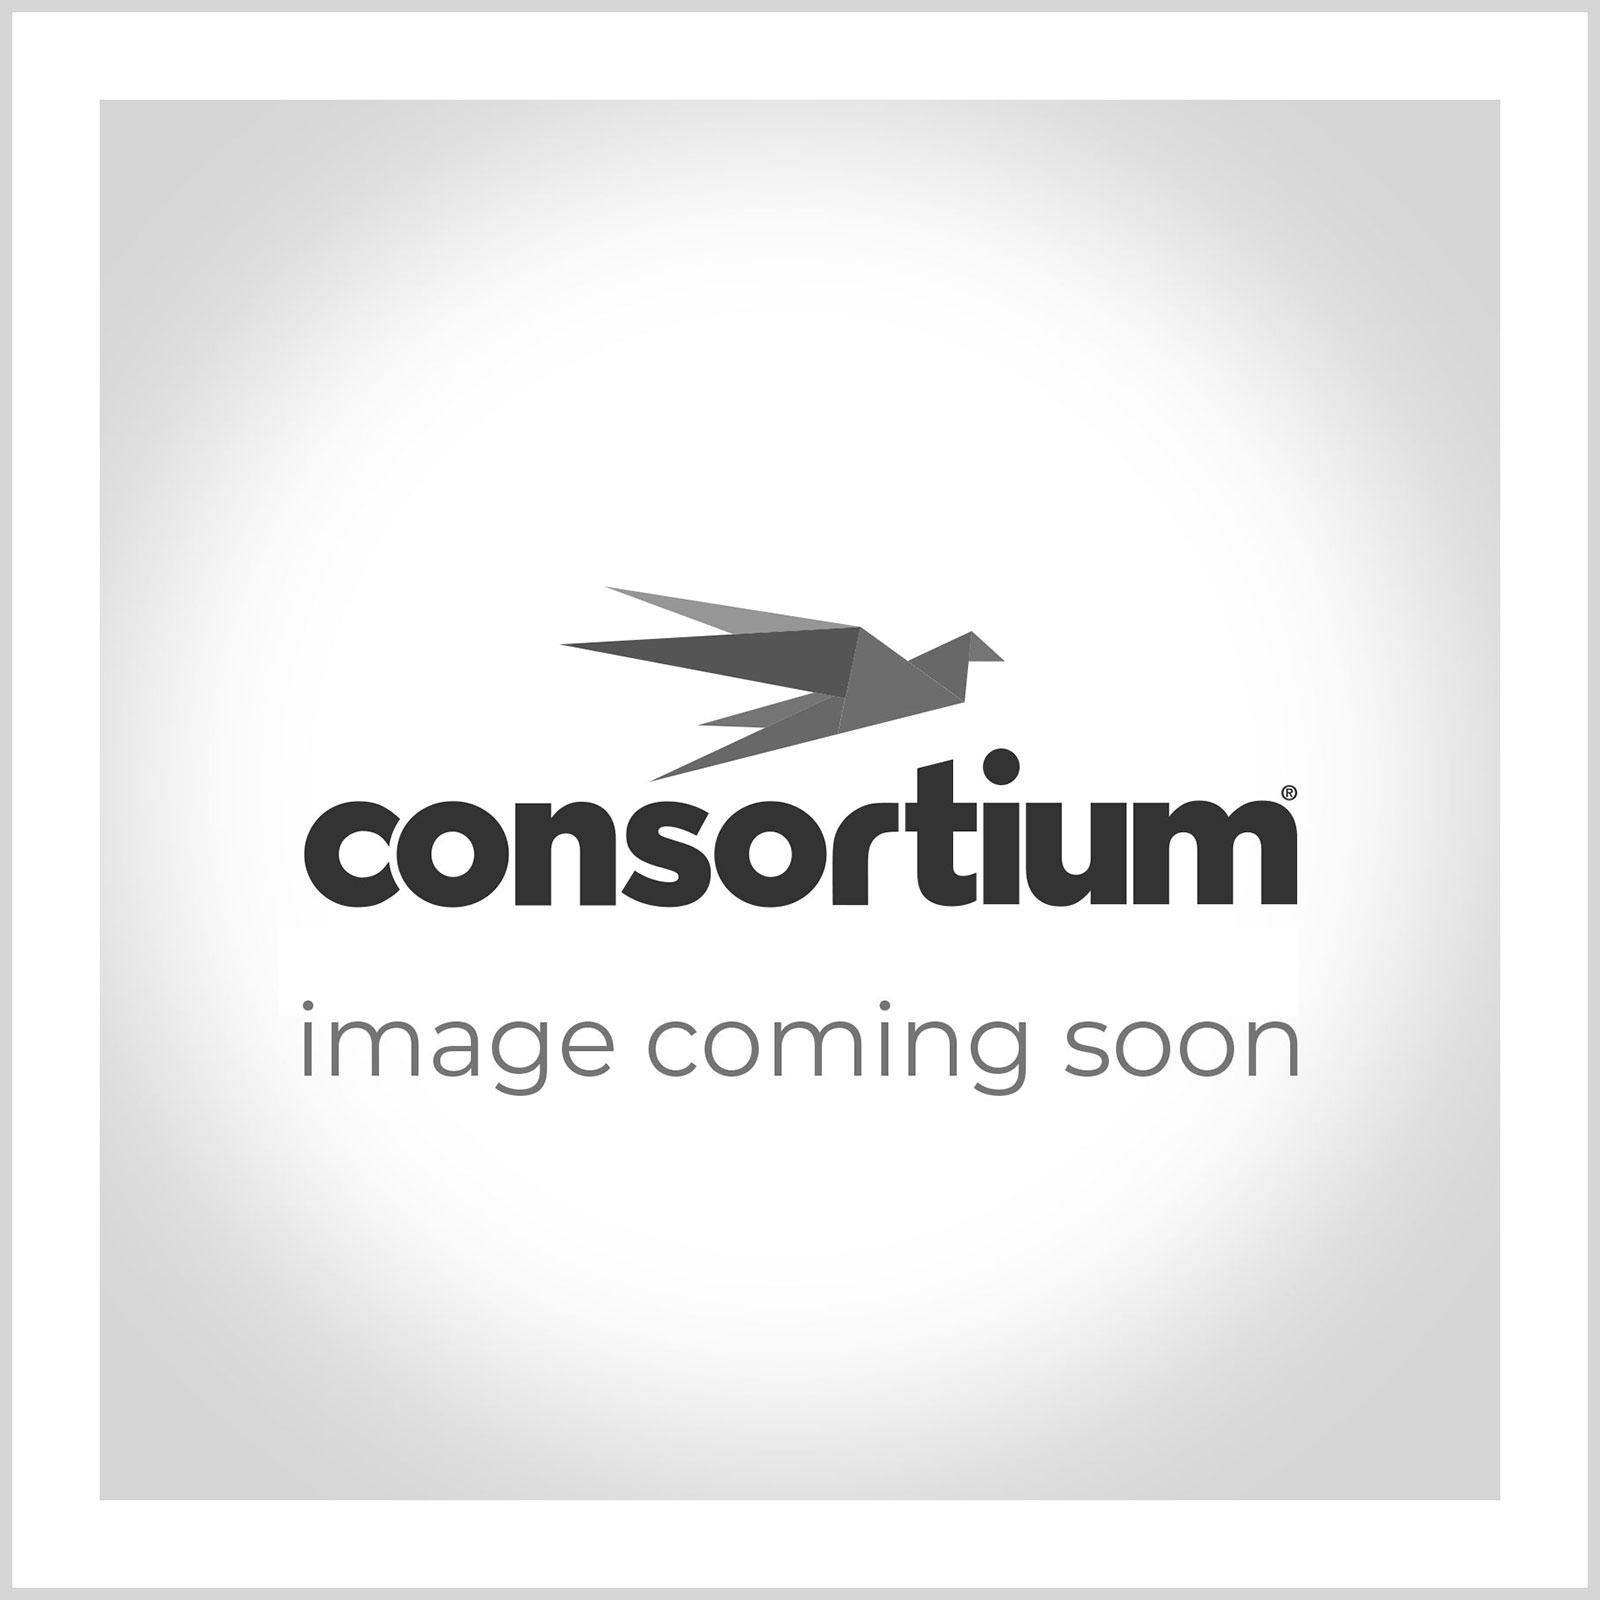 Consortium First Mark Wax Crayons